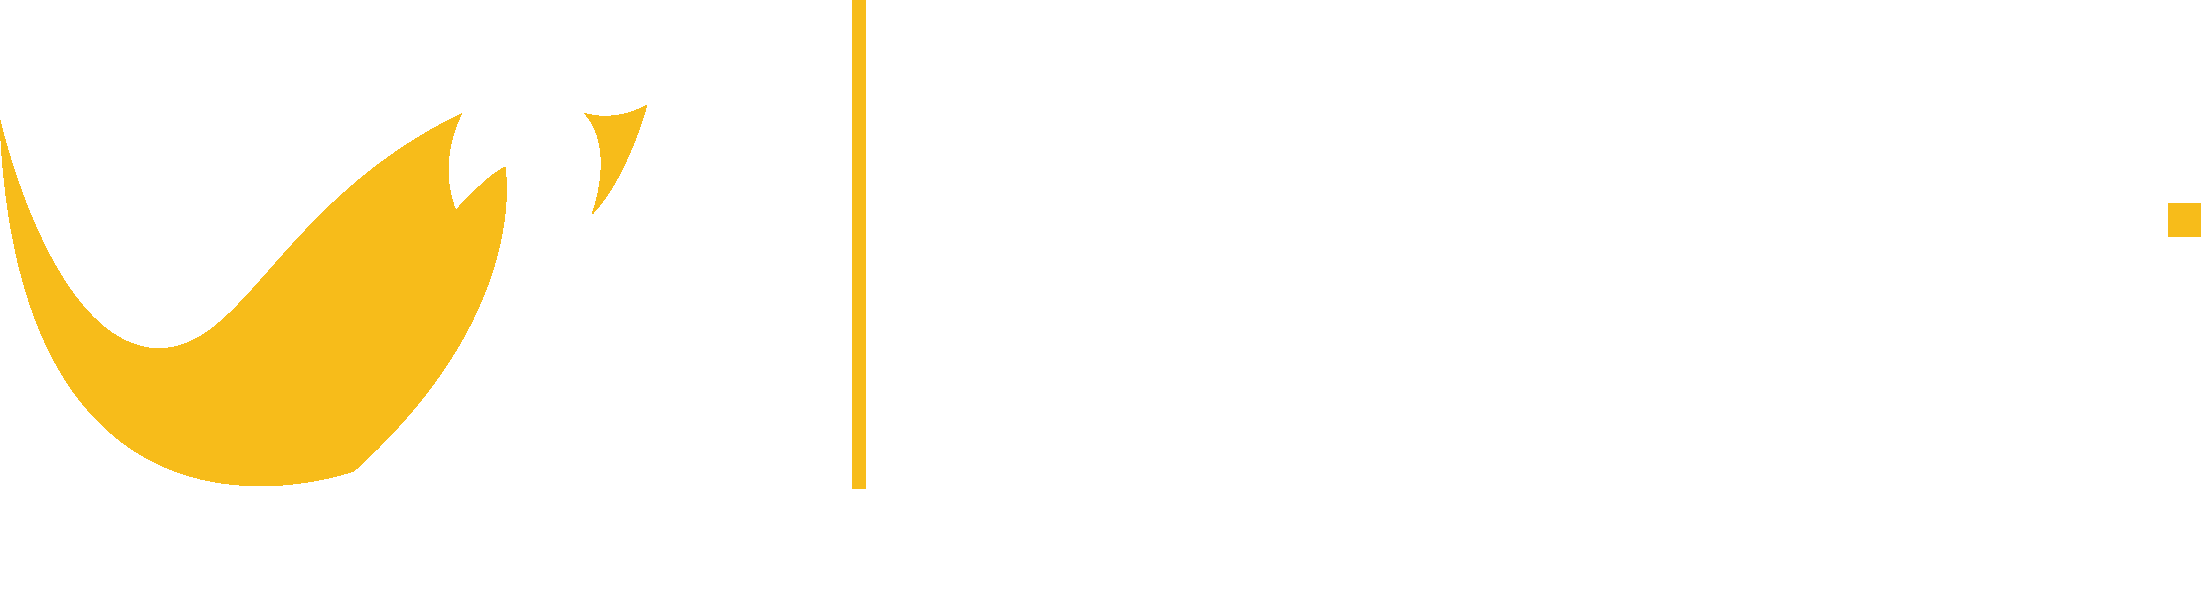 https://campaign-image.eu/zohocampaigns/71975000000270082_zc_v33_1615749999280_fokus_msp_logo_weiß_gelb.png